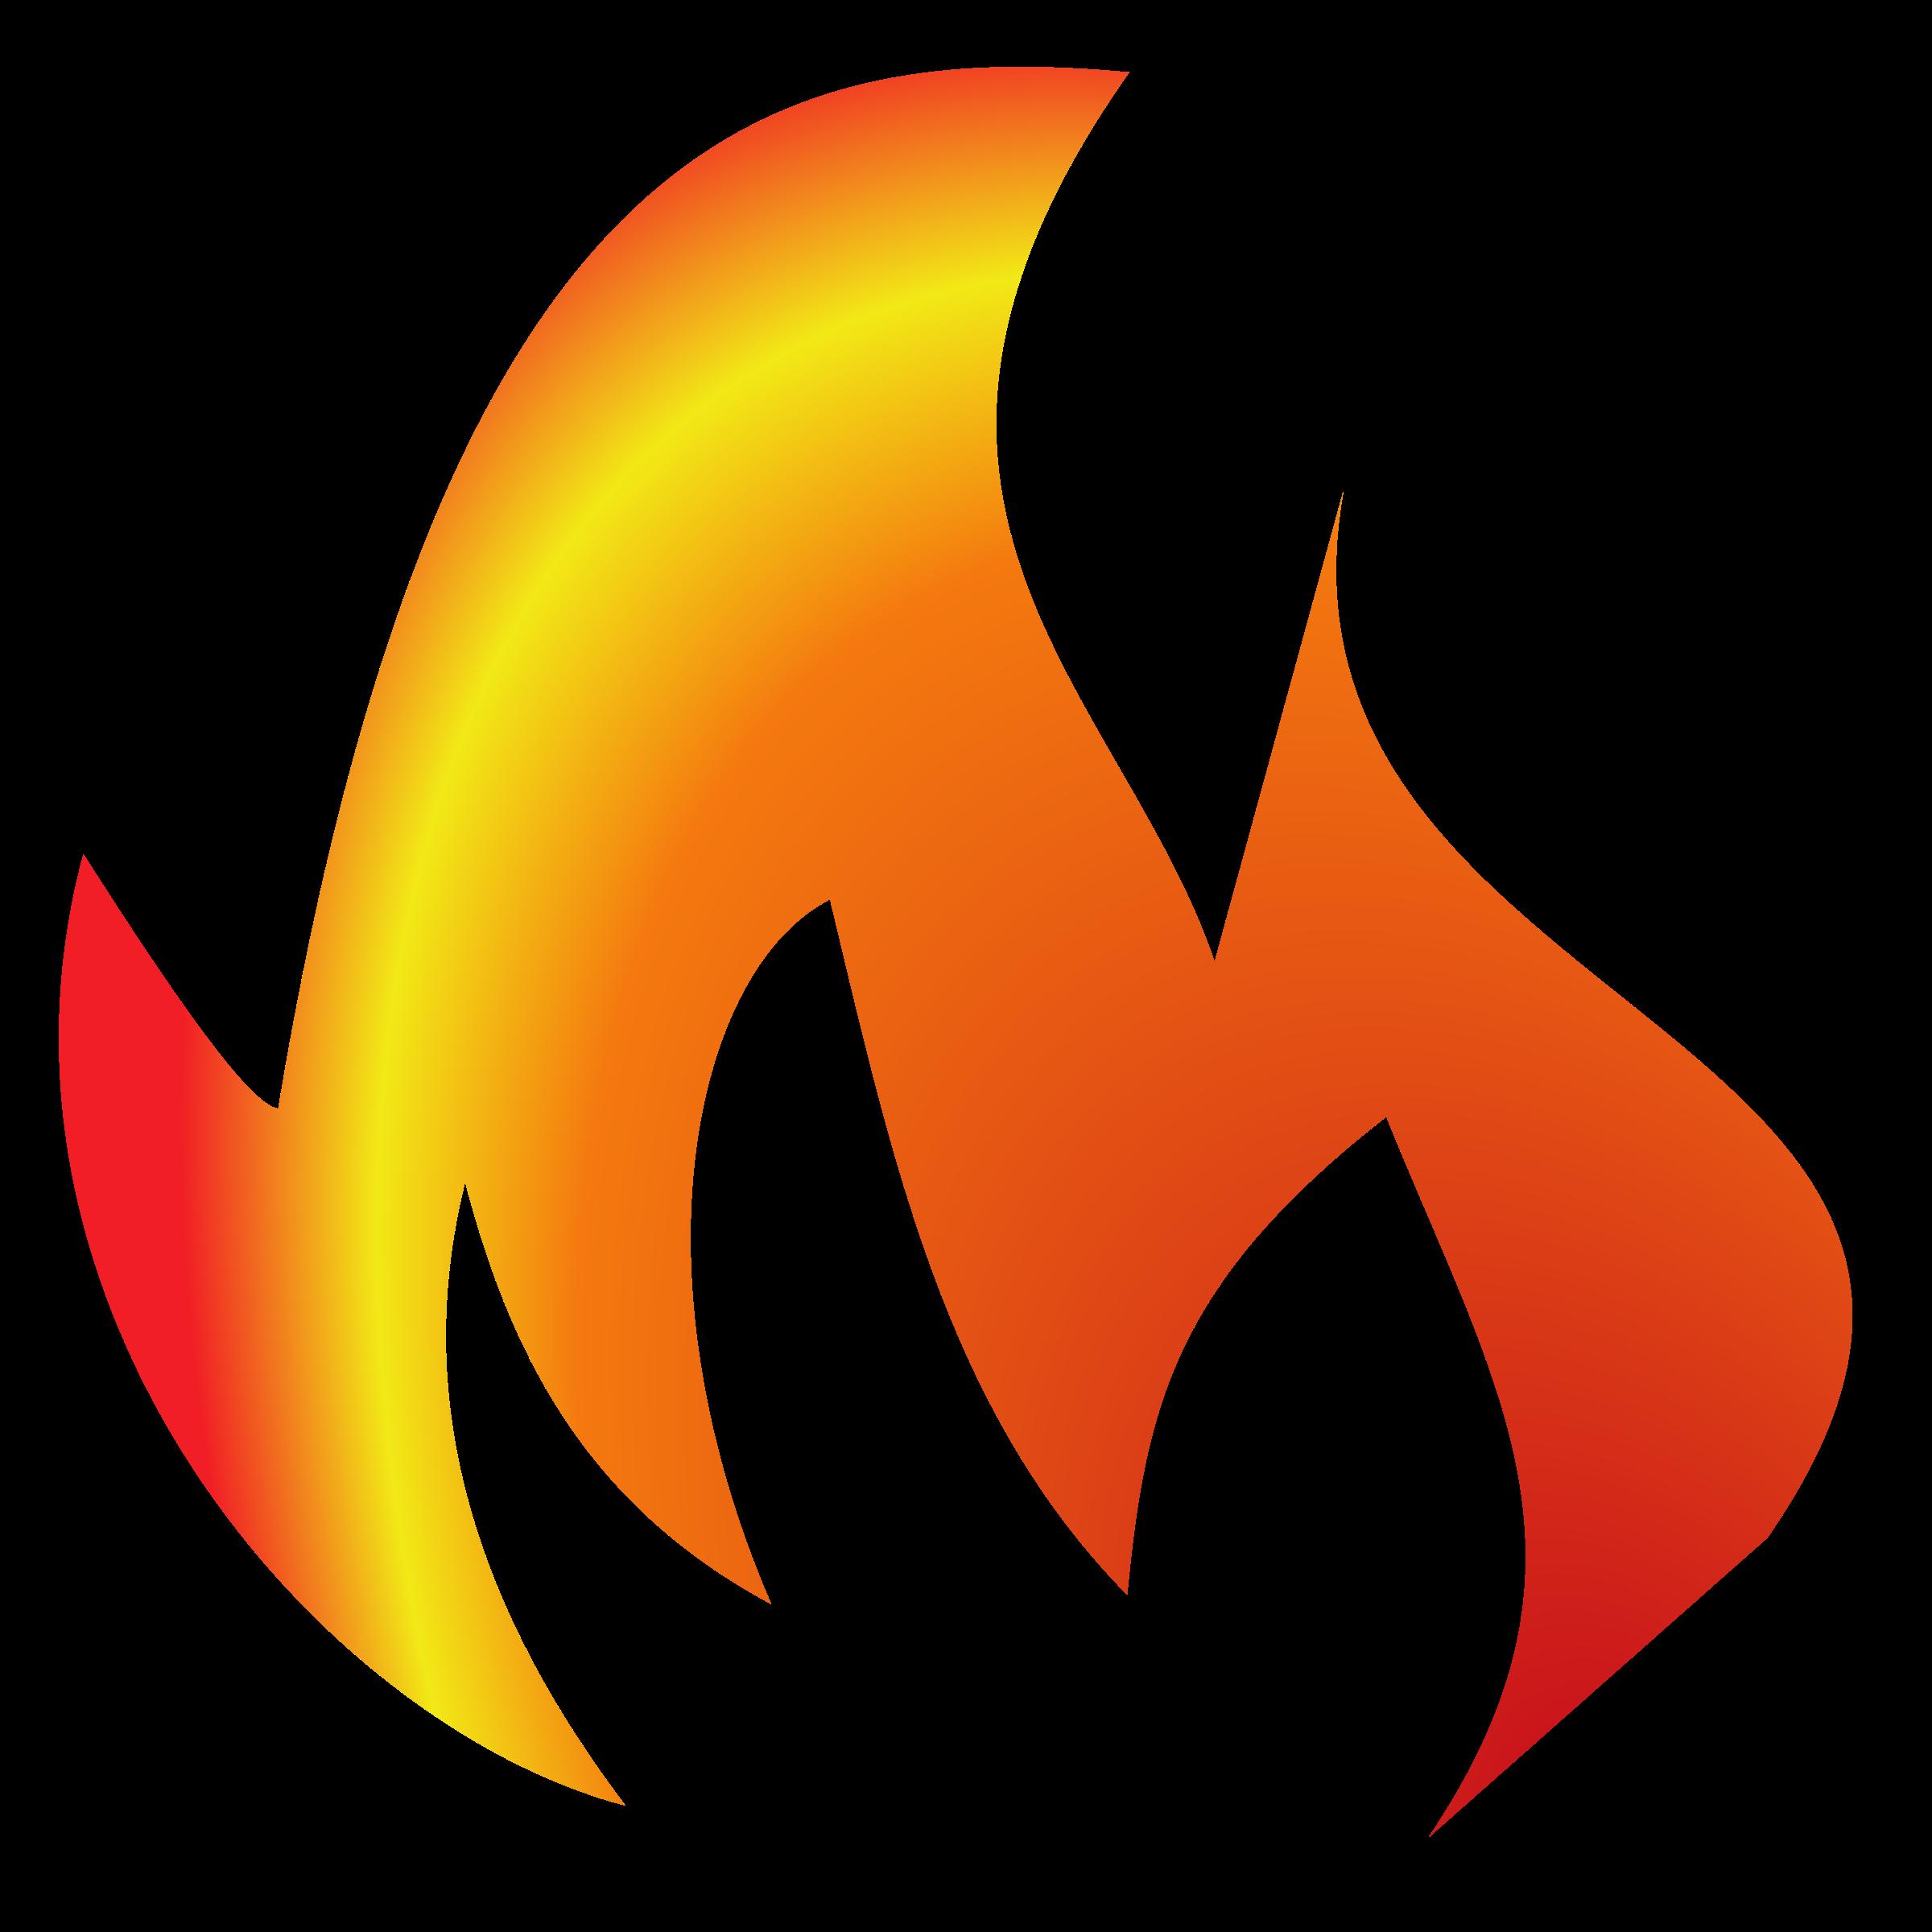 Clipart flames file, Clipart flames file Transparent FREE.